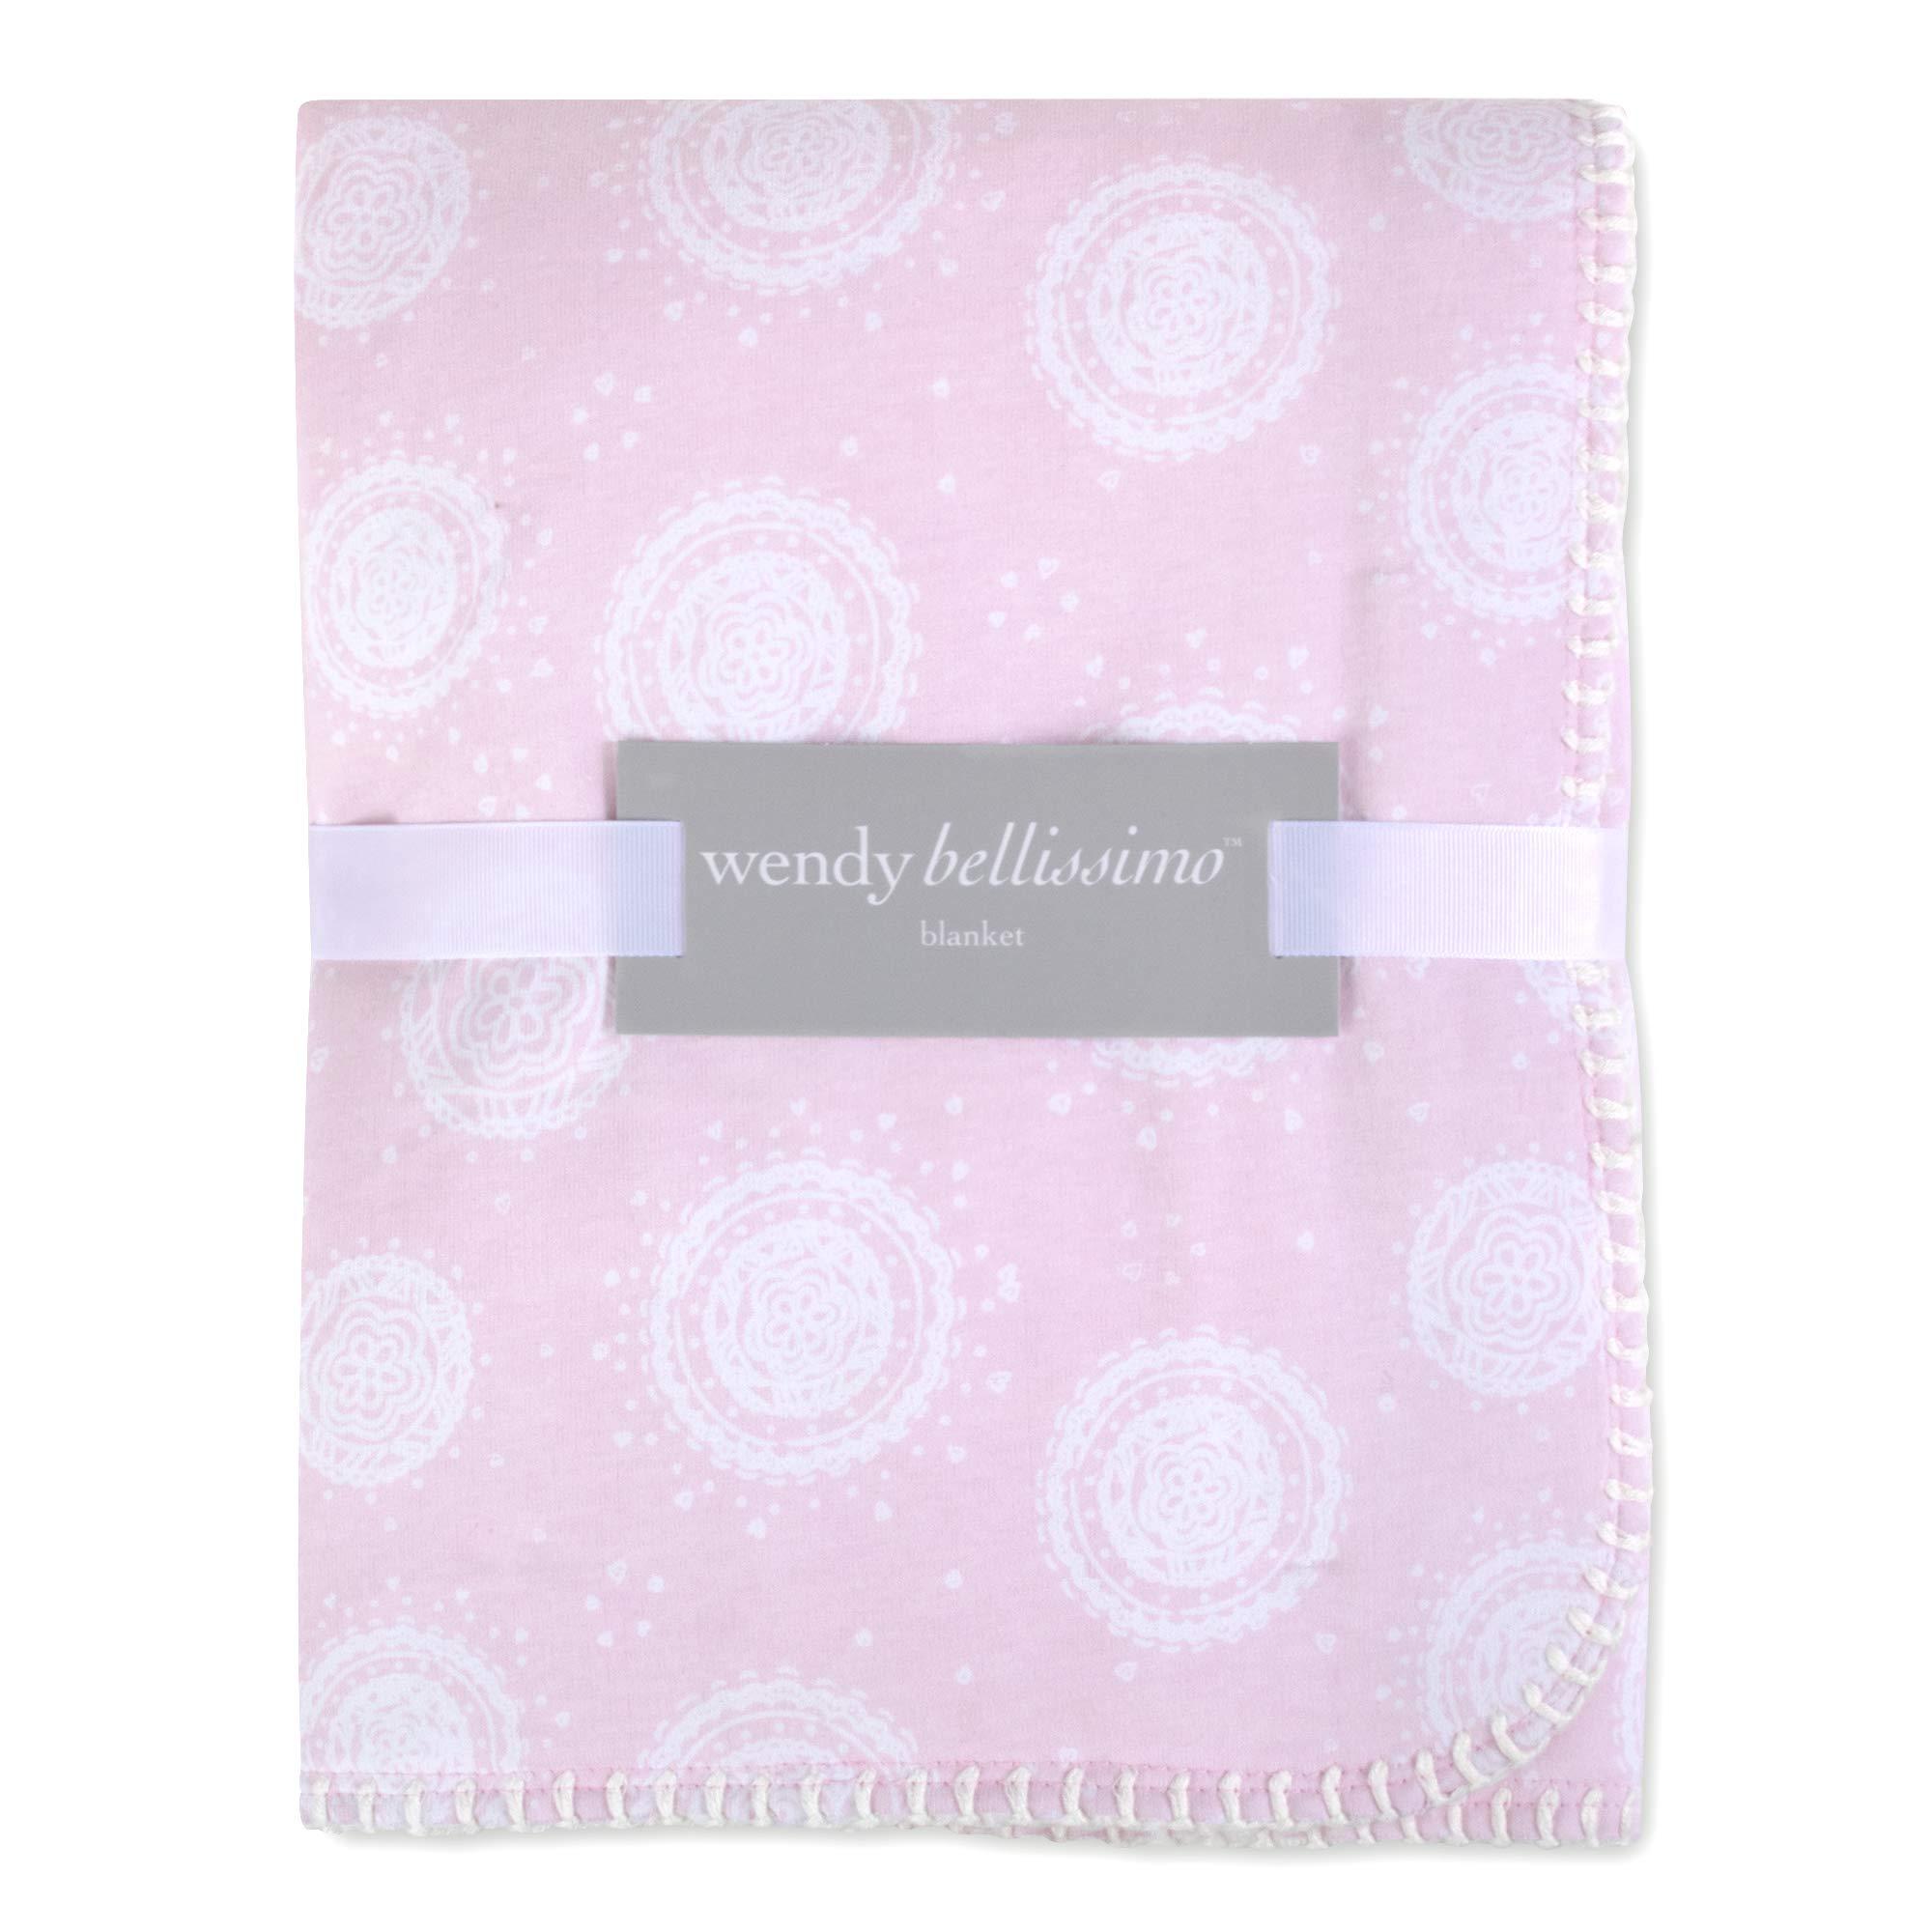 Wendy Bellissimo Super Soft Plush Baby Blanket (30x40) - Medallion in Pink/White